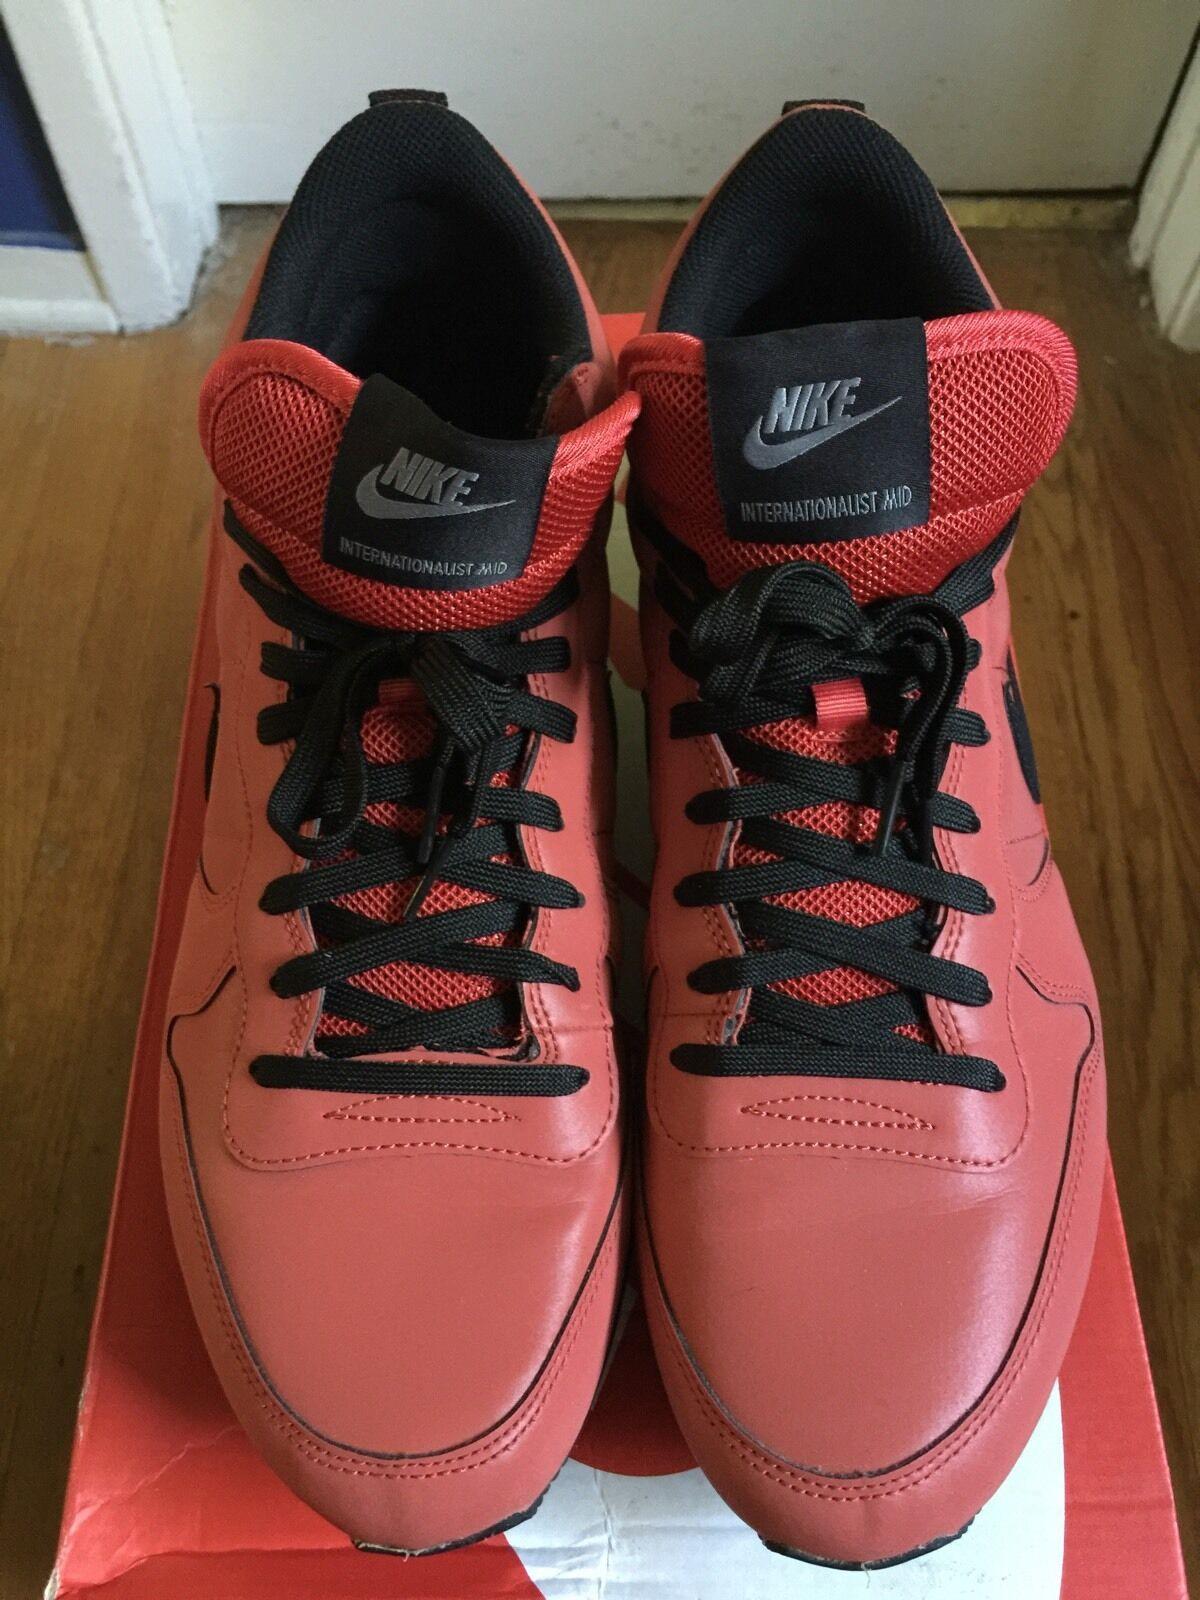 Nike Internationalist Mid Red Reflective